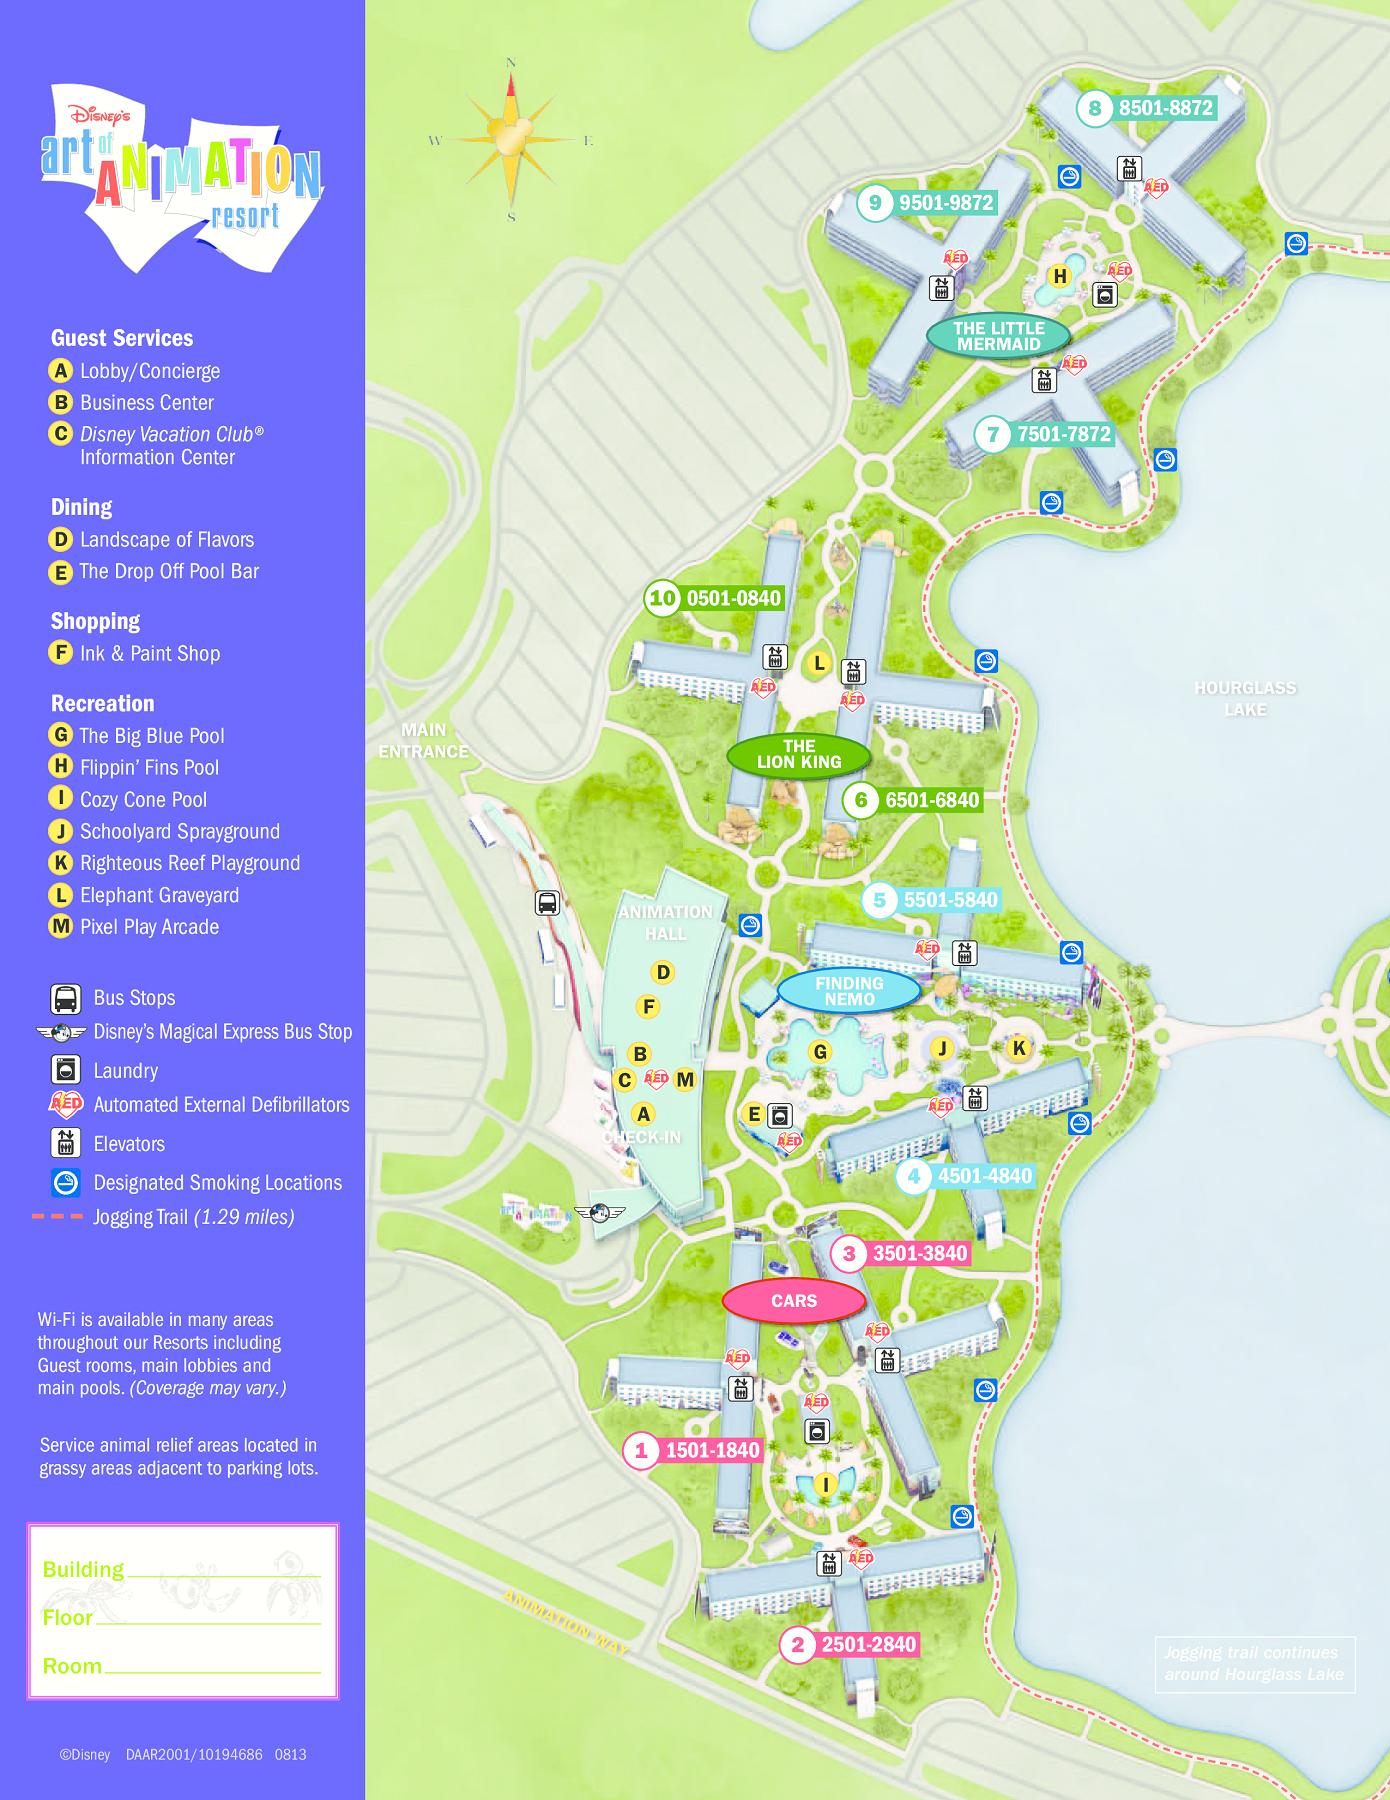 Walt Disney World Maps  WDW Planning